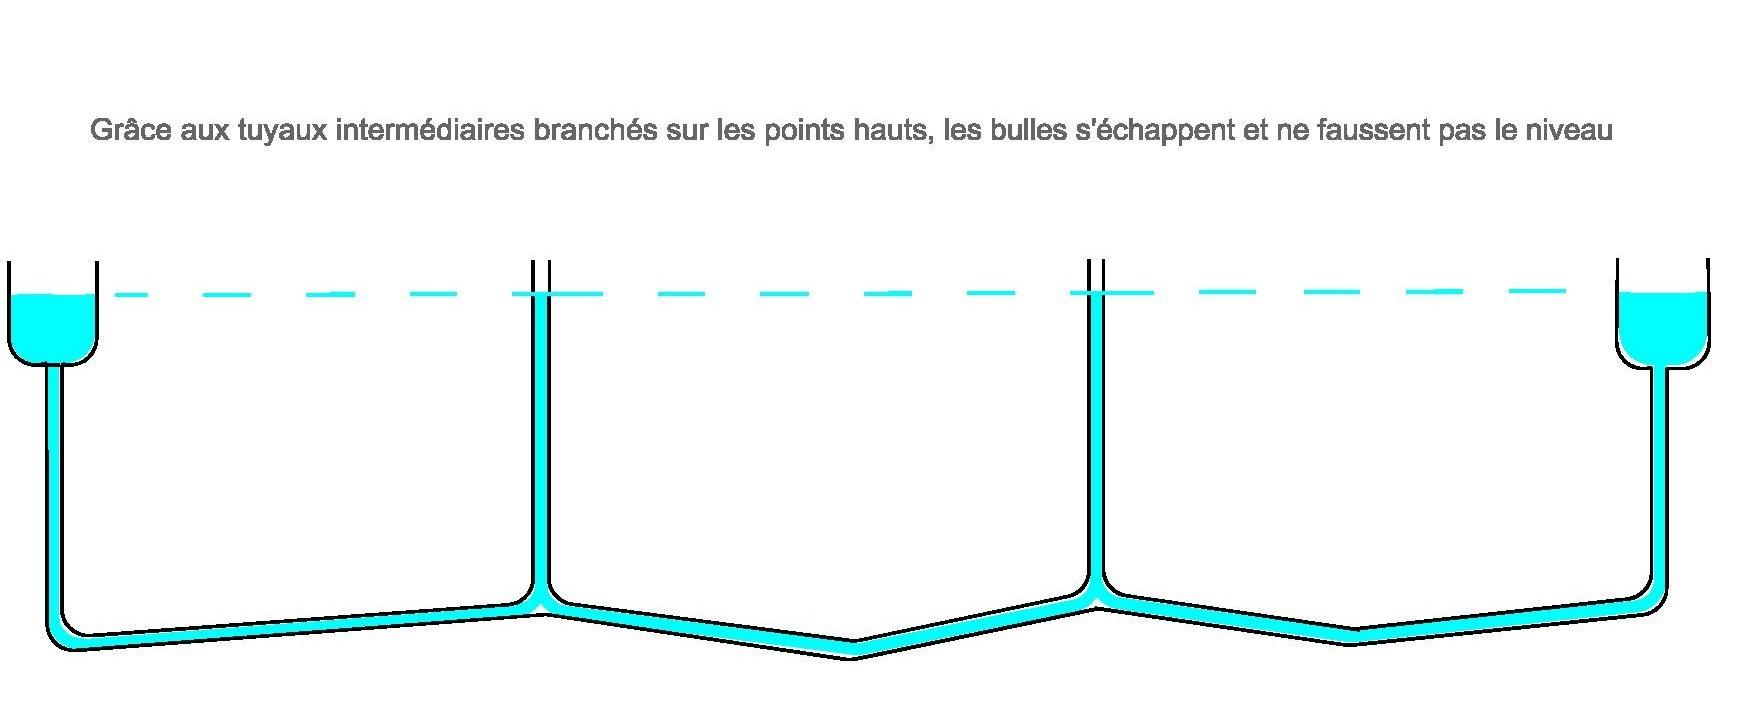 http://www.academie-pontdugard.com/wp-content/uploads/2013/11/niveau-%C3%A0eau-longue-port%C3%A9e-Model-_1_-e1385029187209.jpg